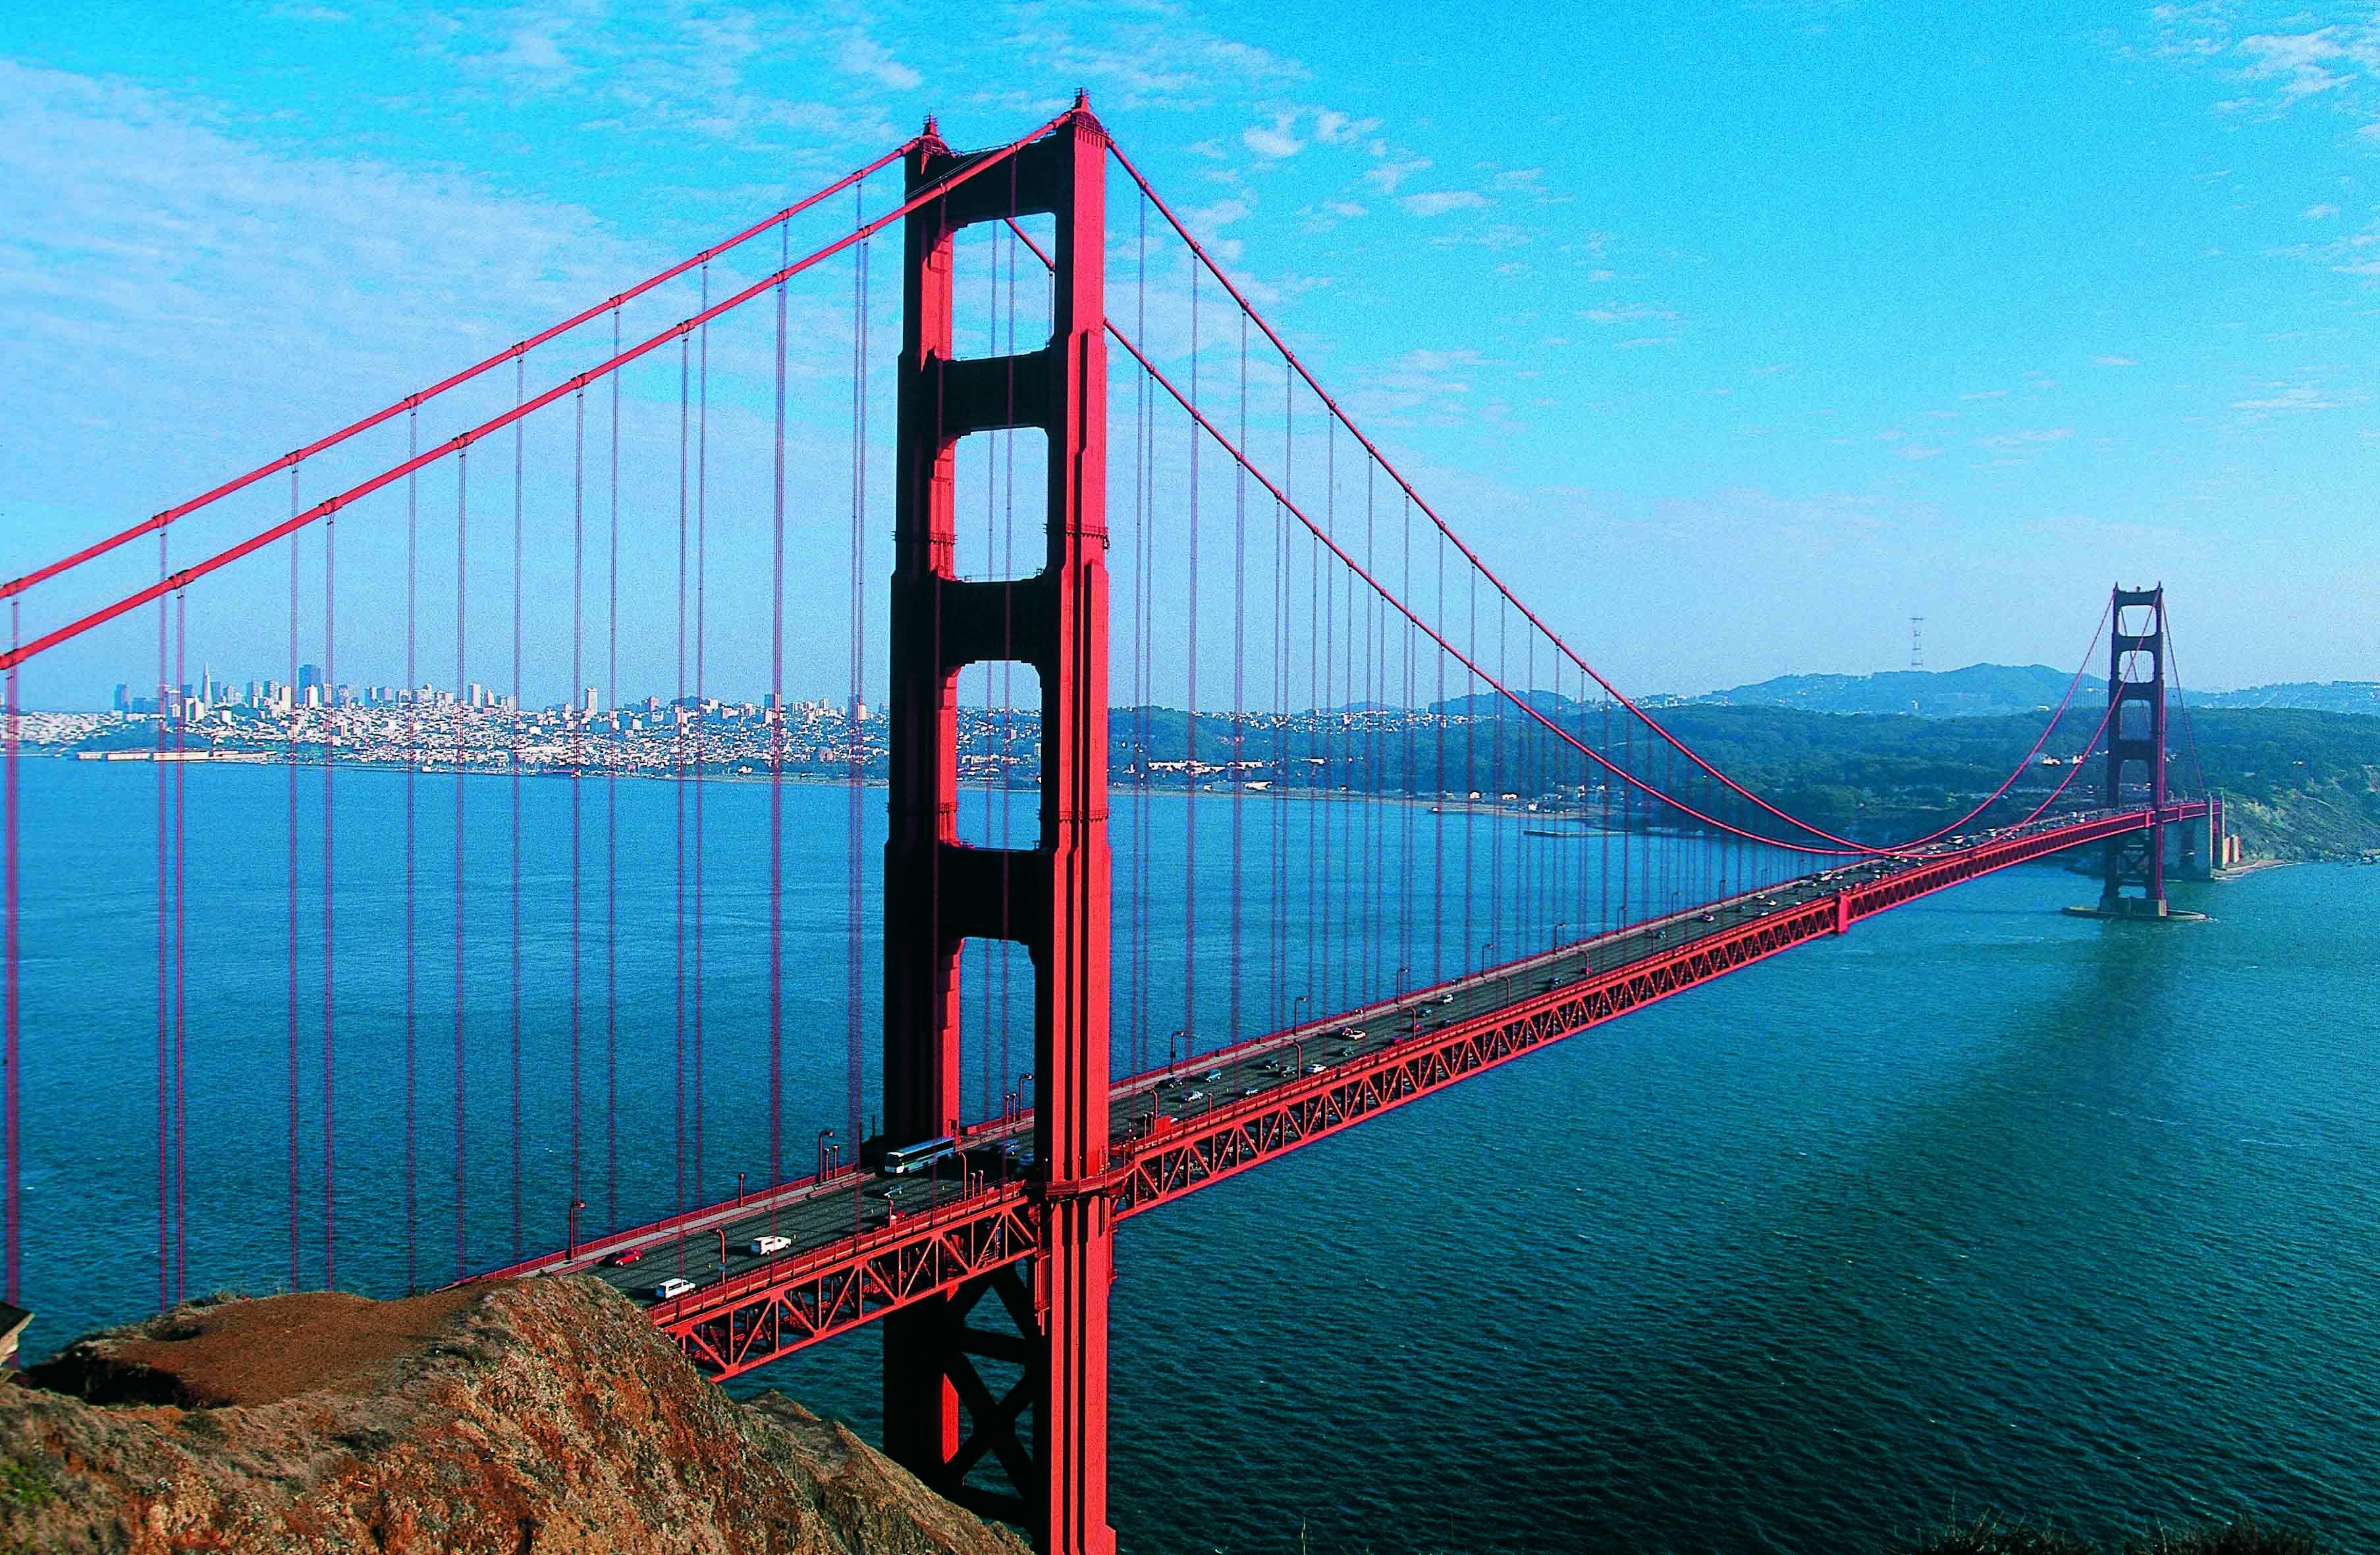 55 beautiful pictures of the golden gate bridge in san - Bridge wallpaper hd ...